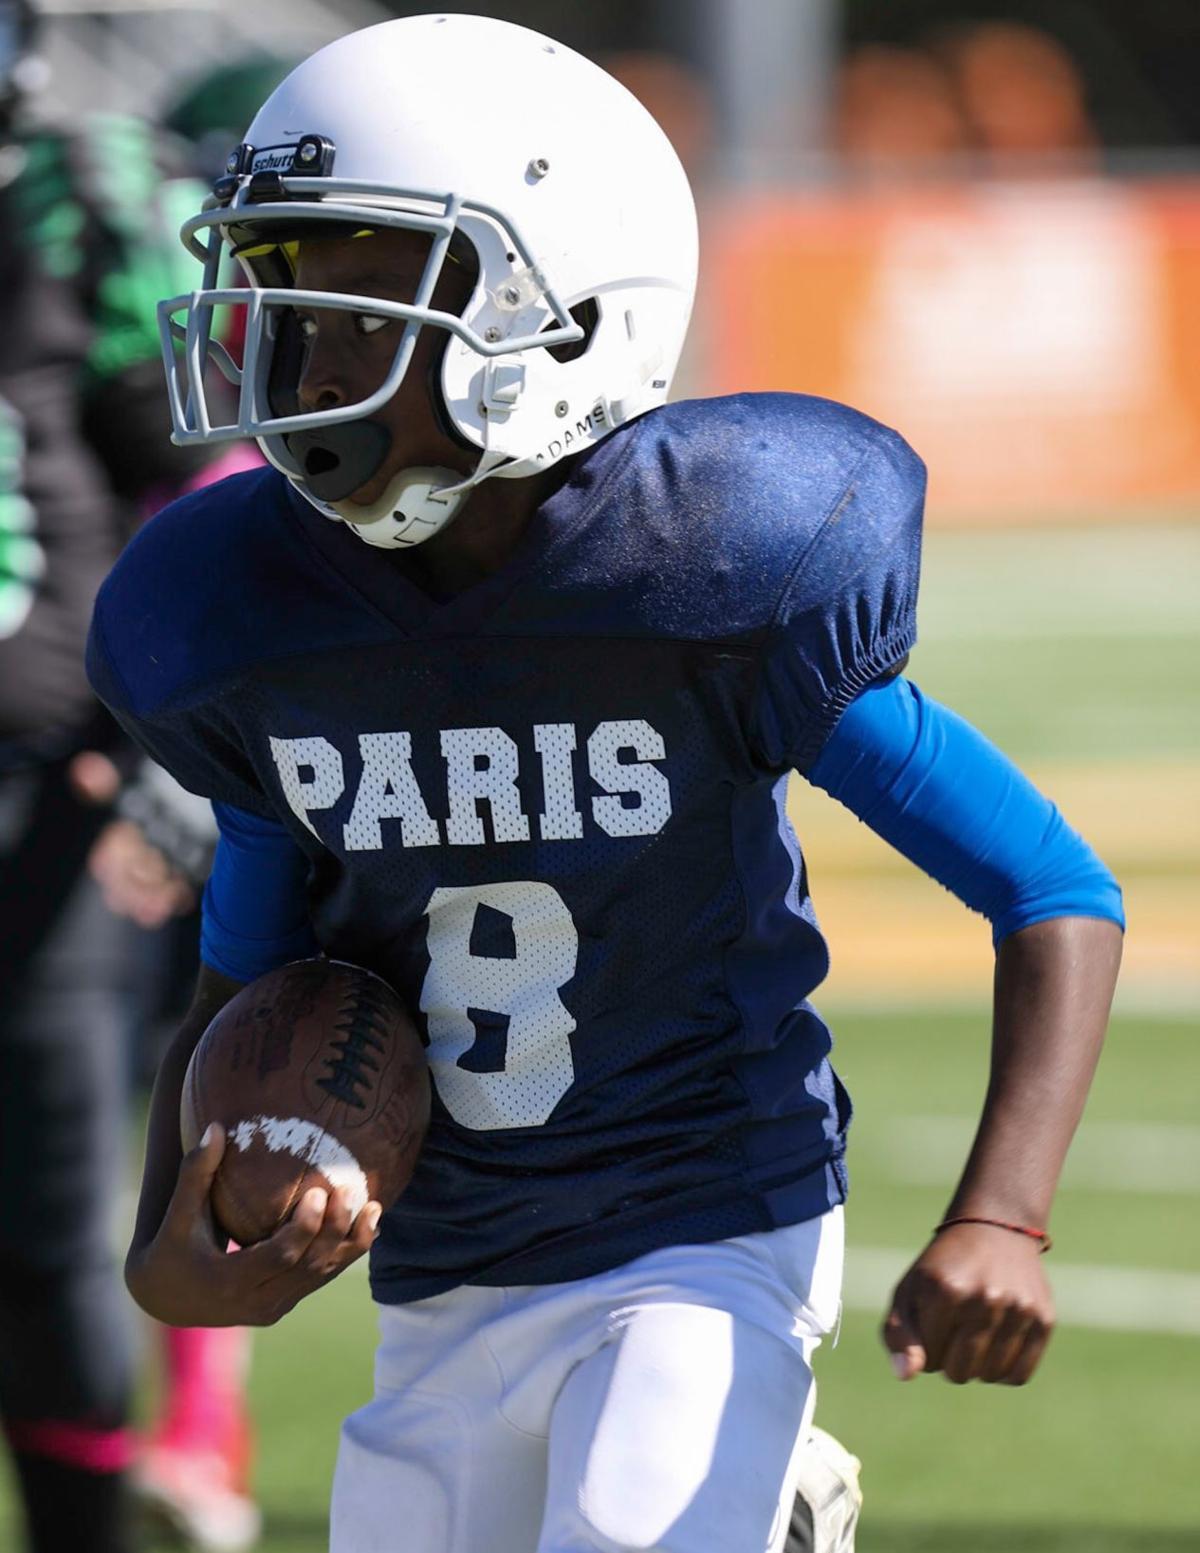 Paris youth football